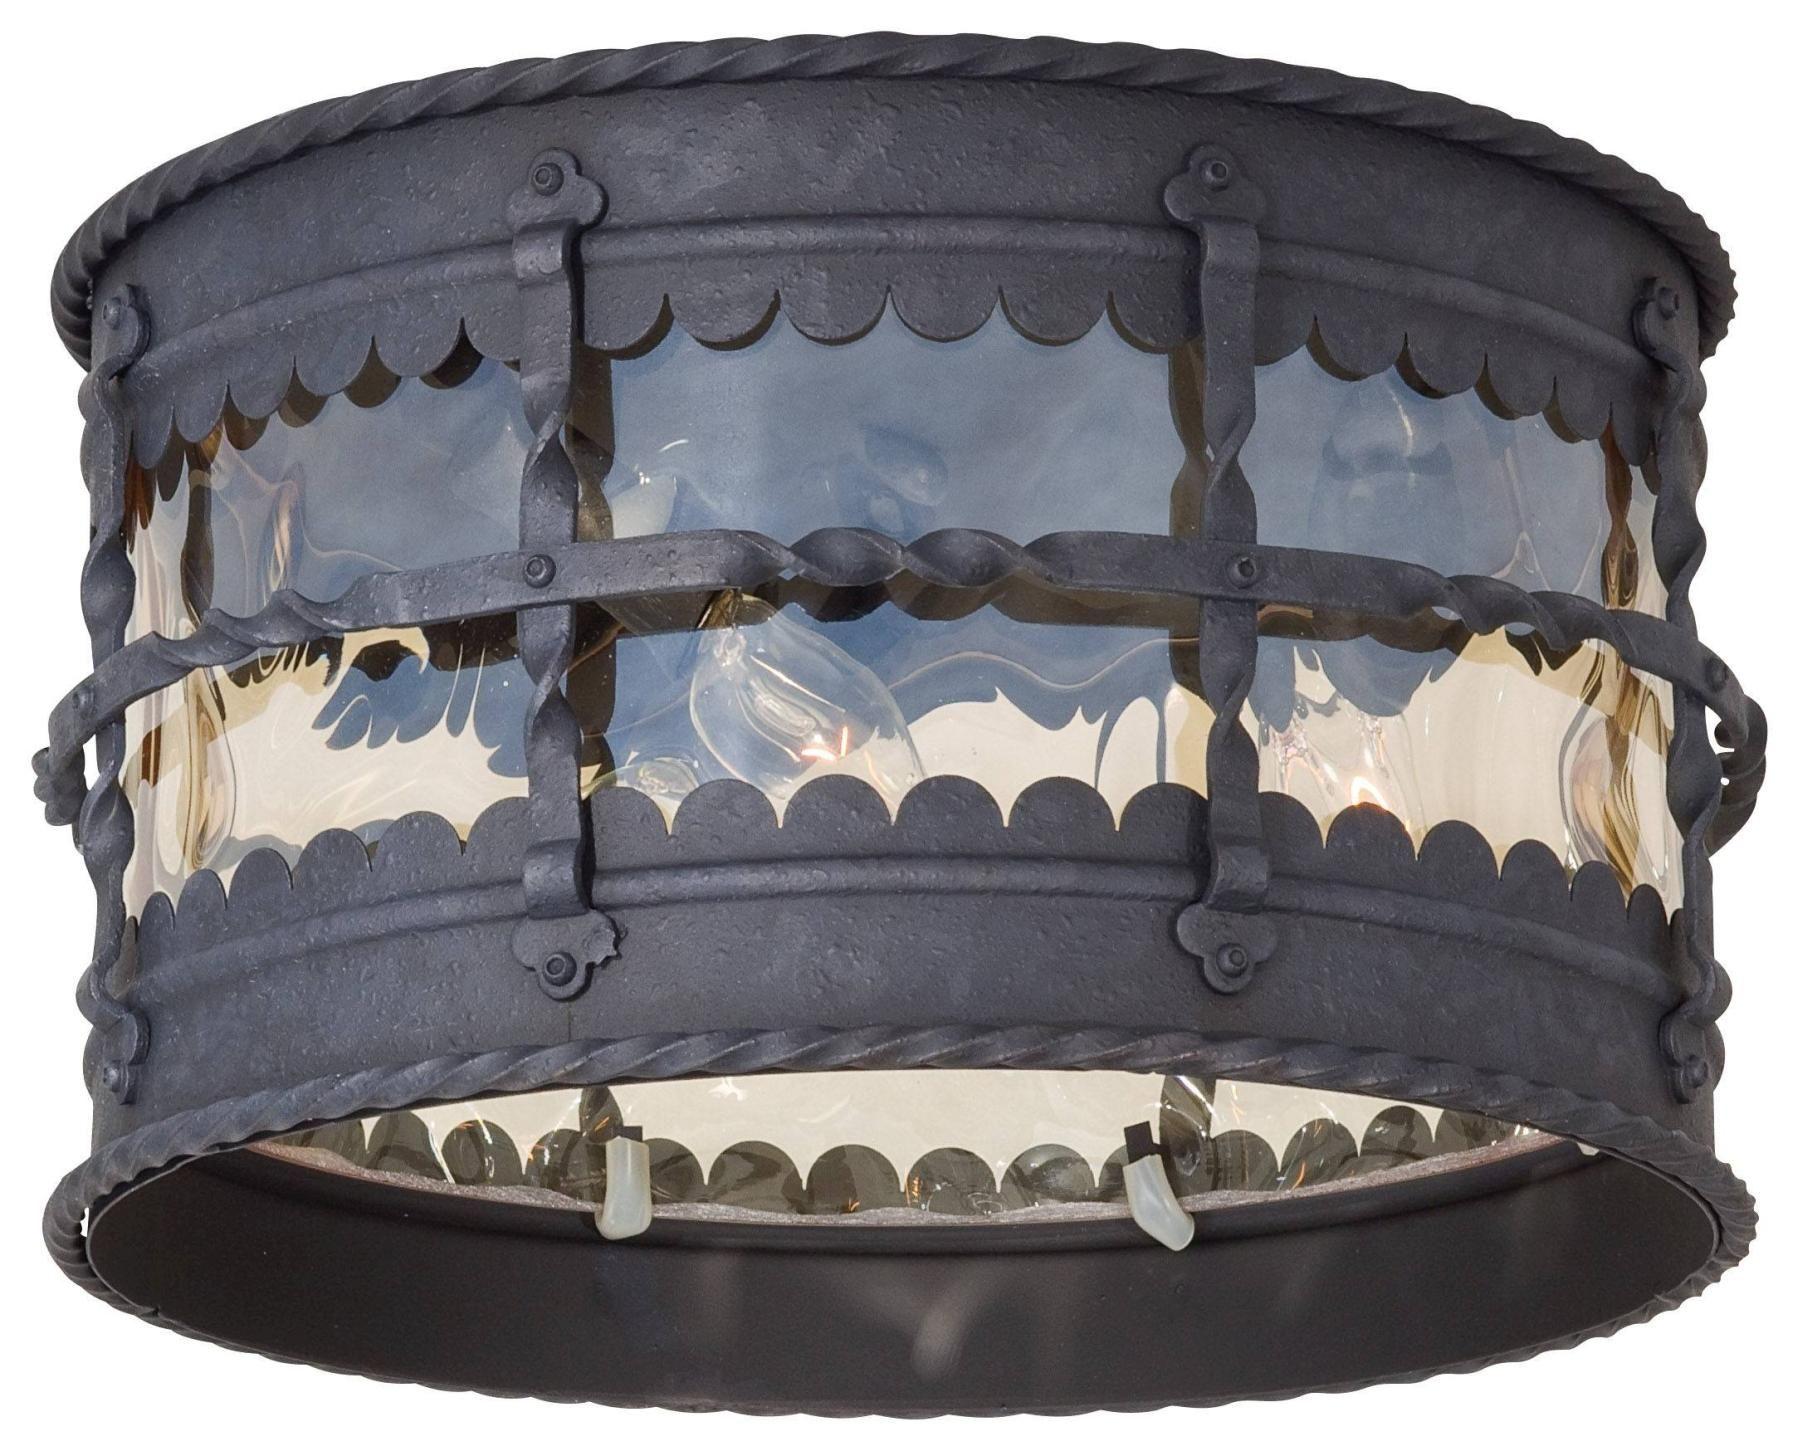 Minka Lavery The Great Outdoors 3 Light Flush Mount In Spanish Iron Textured Black Powder